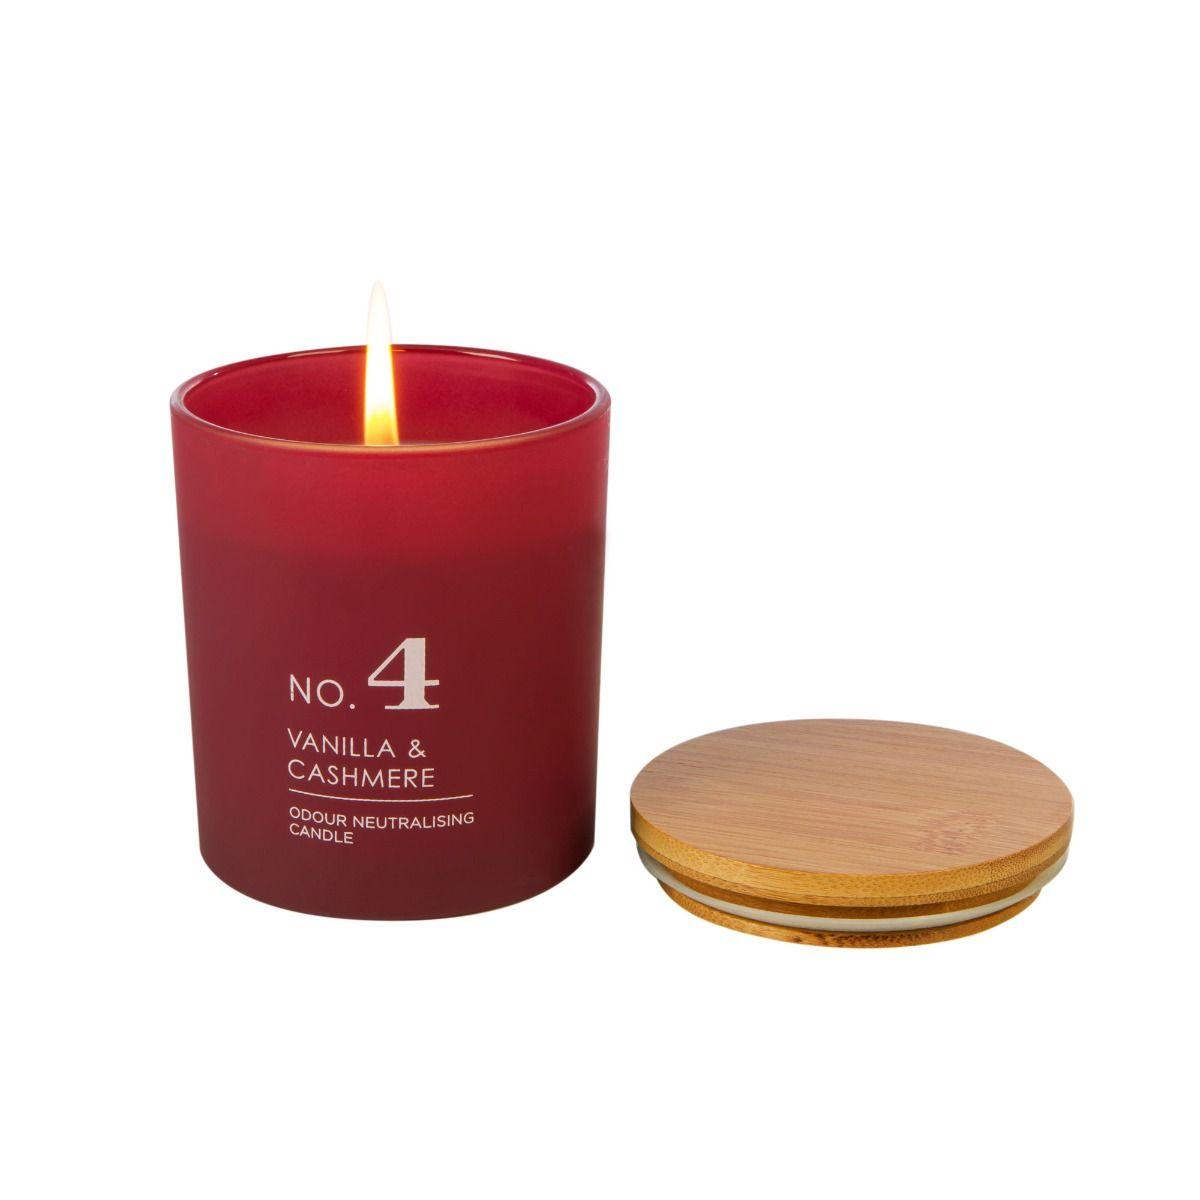 Vanilla & Cashmere Candle